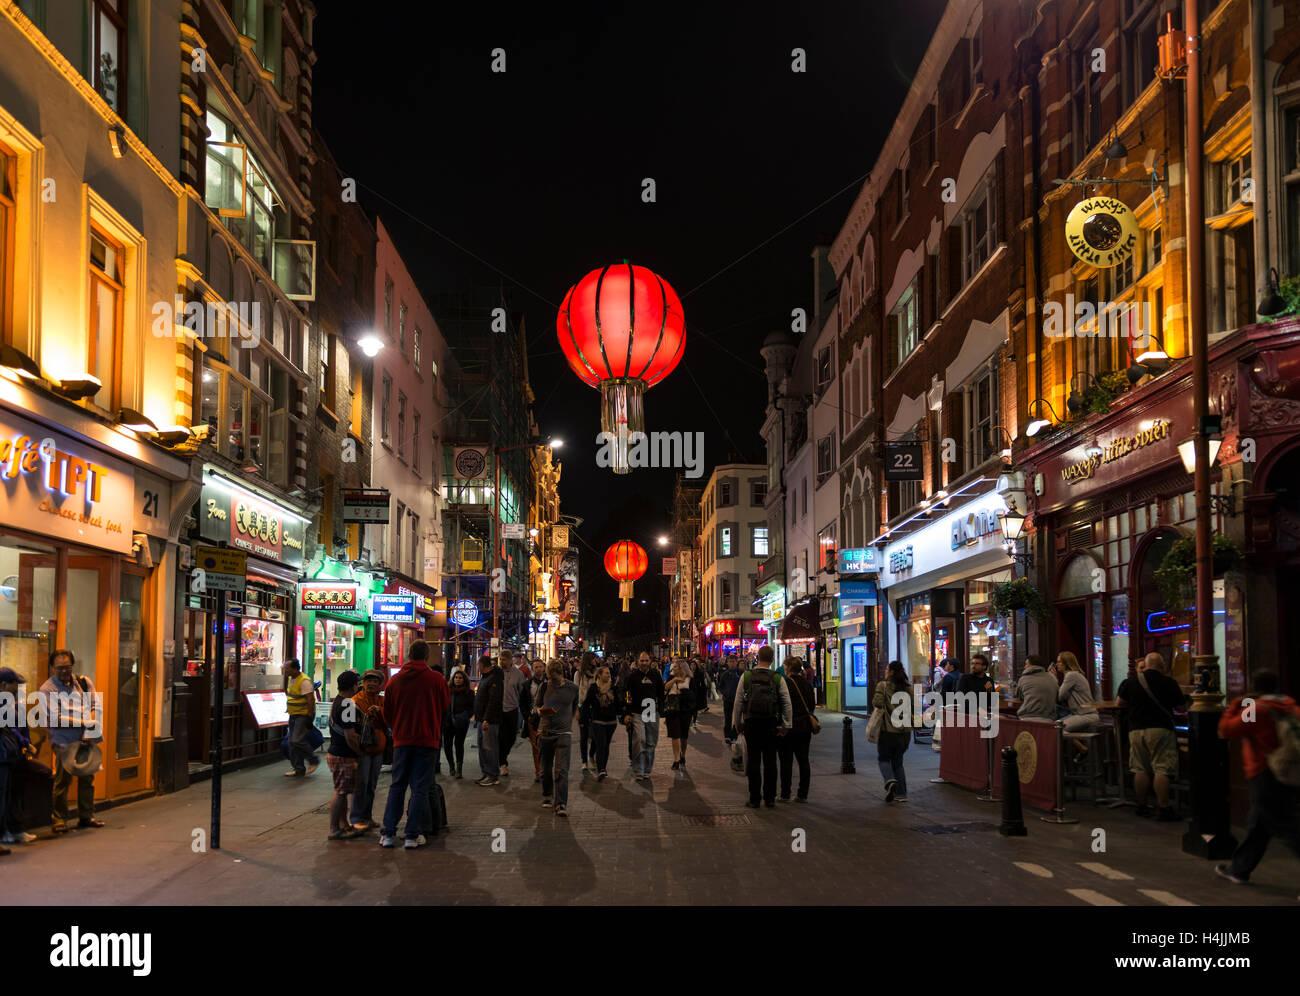 Pedestrians on Wardour Street, Nocturnal street scene, Chinatown, Soho, London, England, United Kingdom - Stock Image